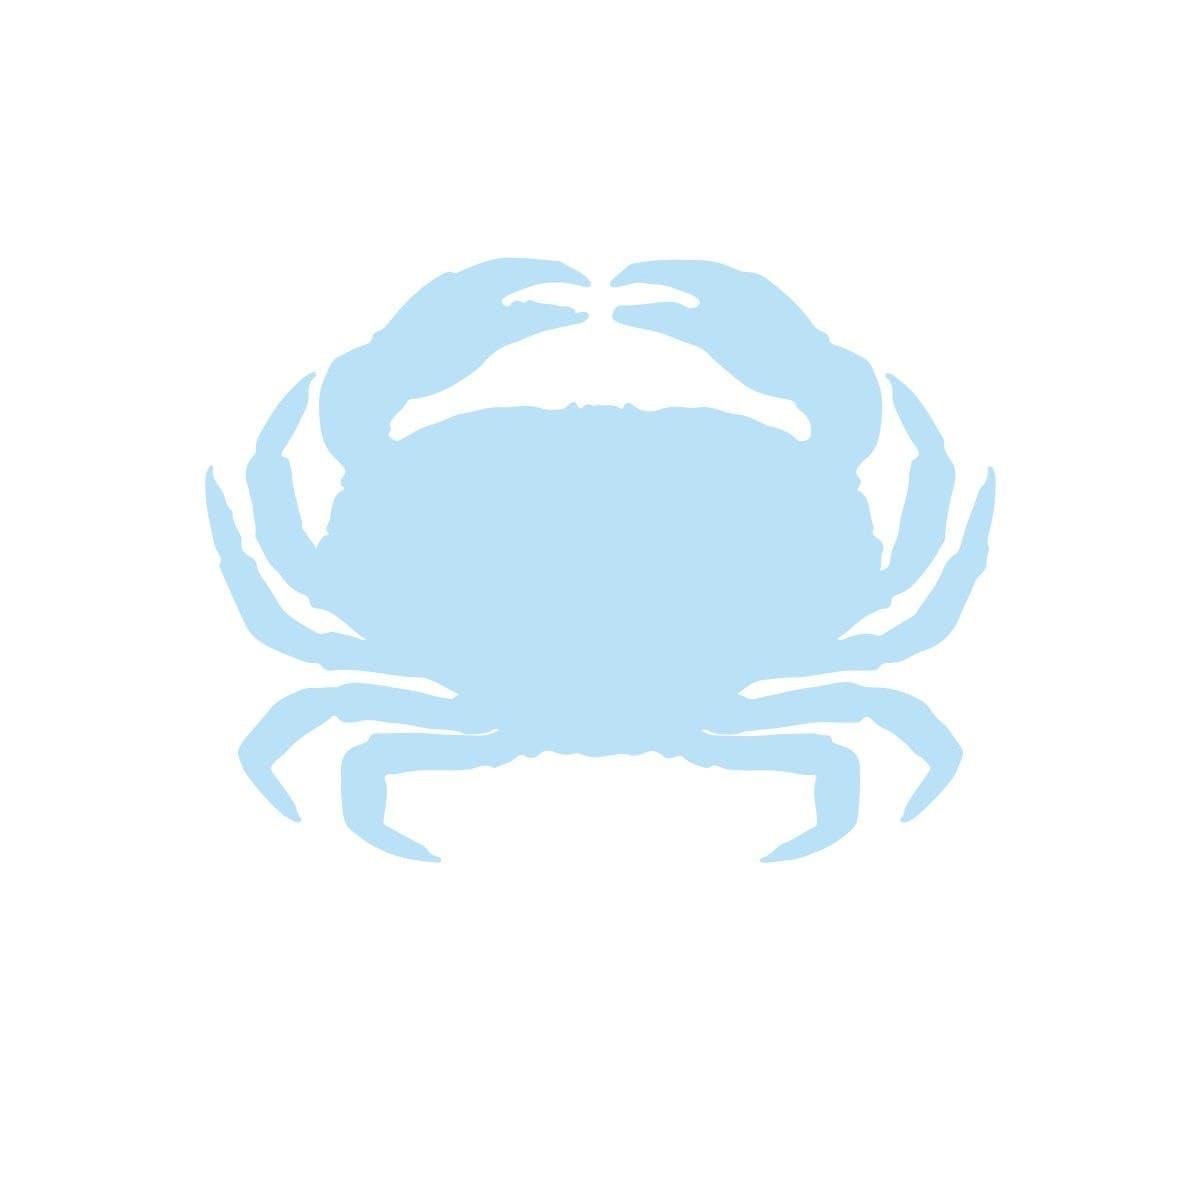 Crab Image - 3